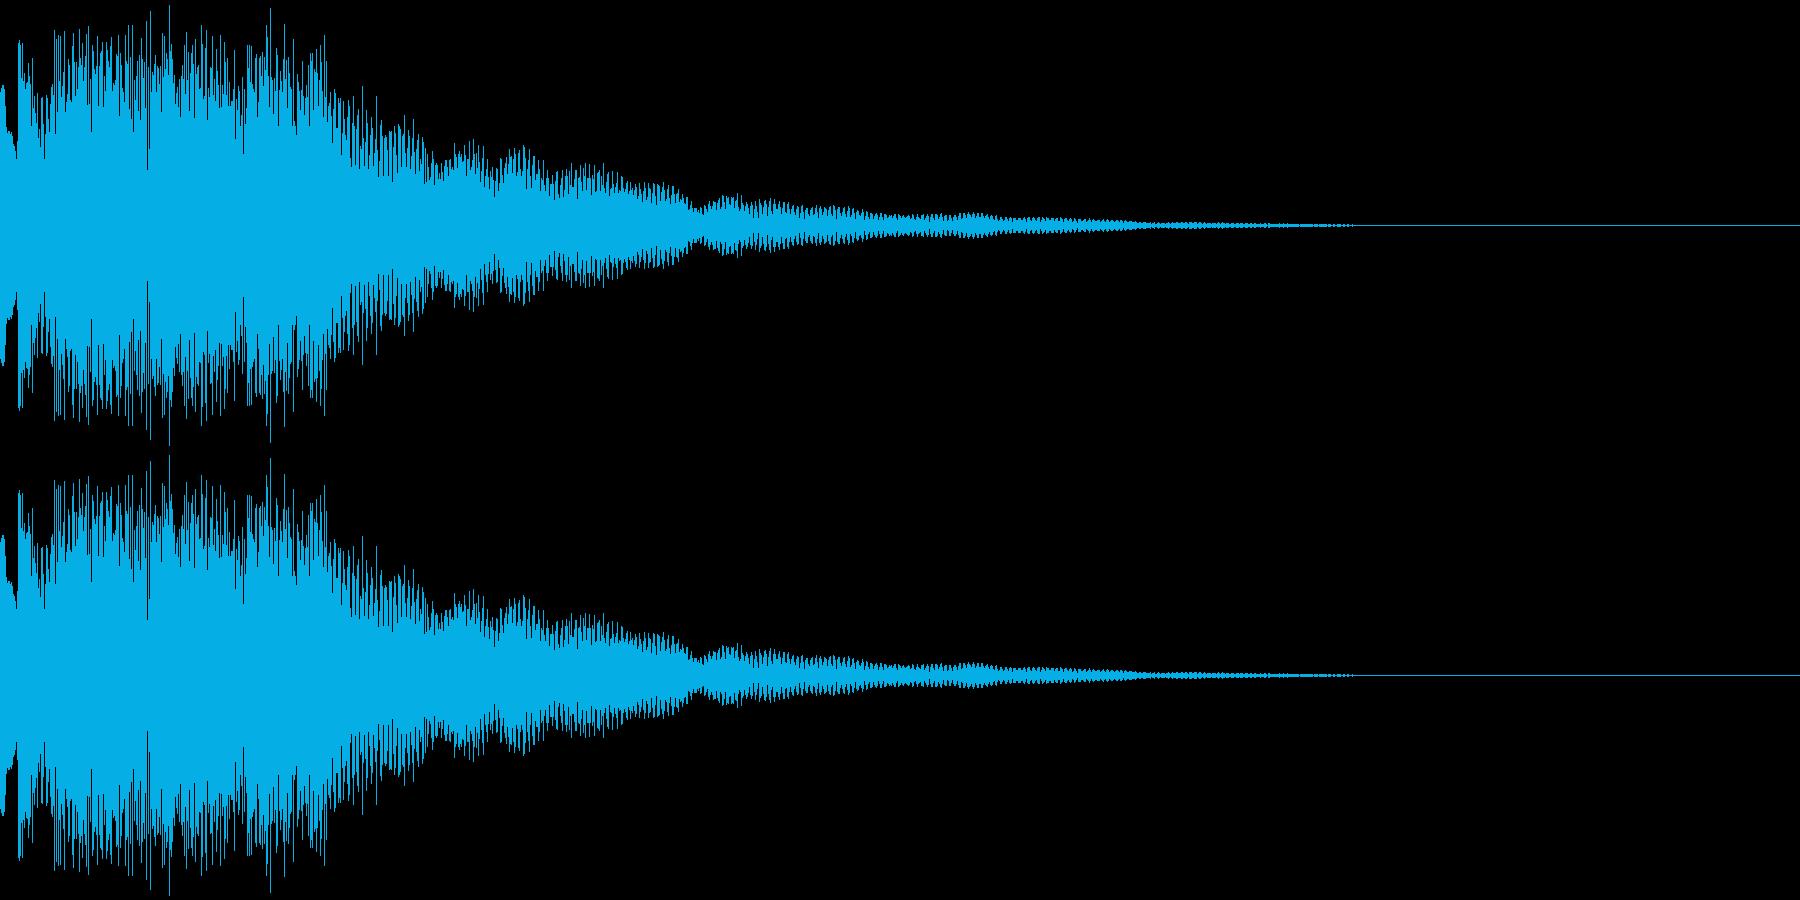 ティロロンティロロンティロロンの再生済みの波形